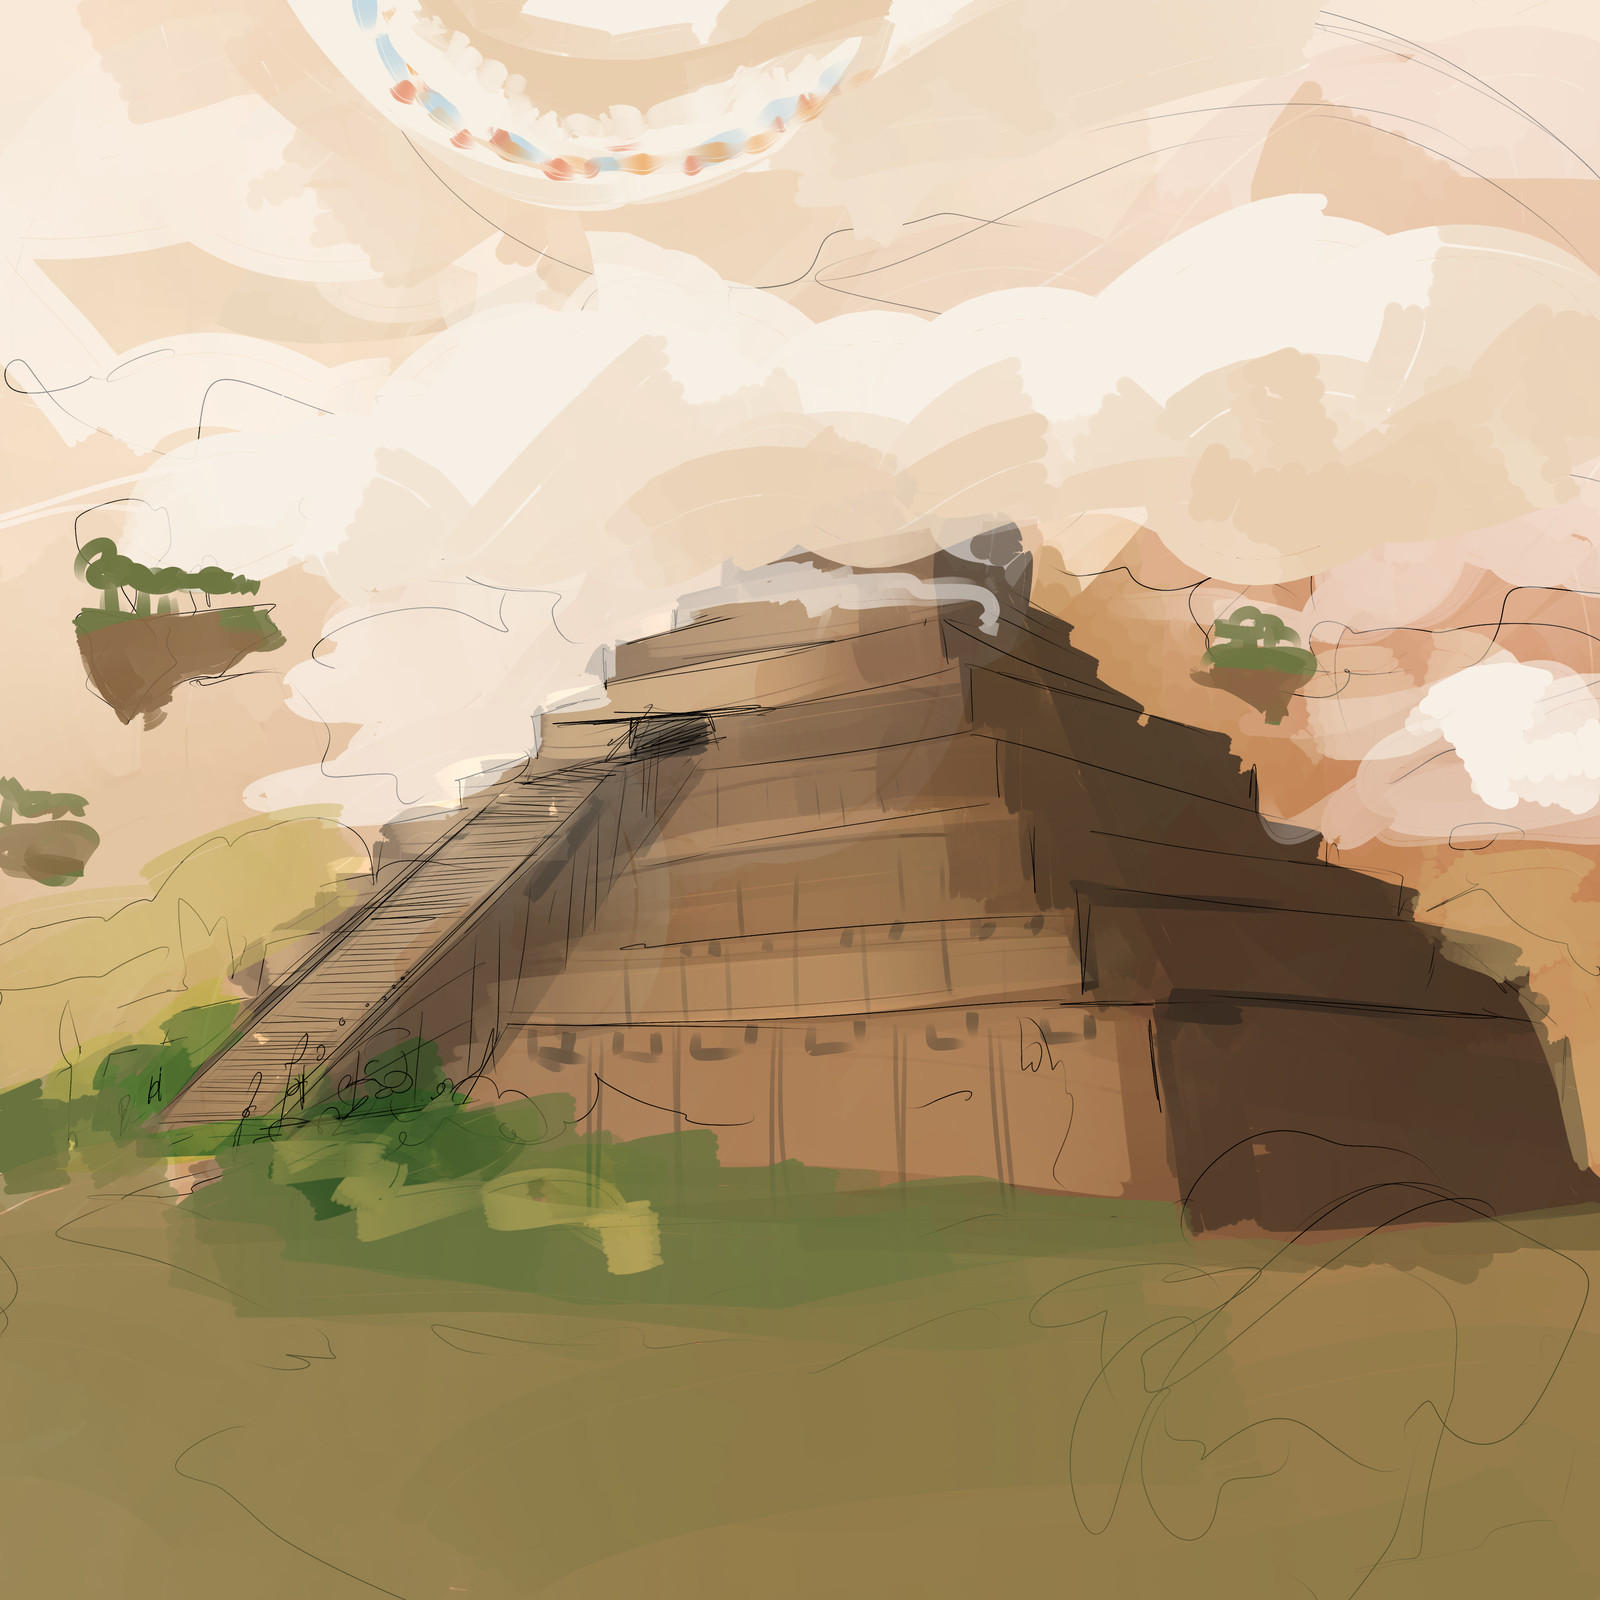 Temple of Quetzal